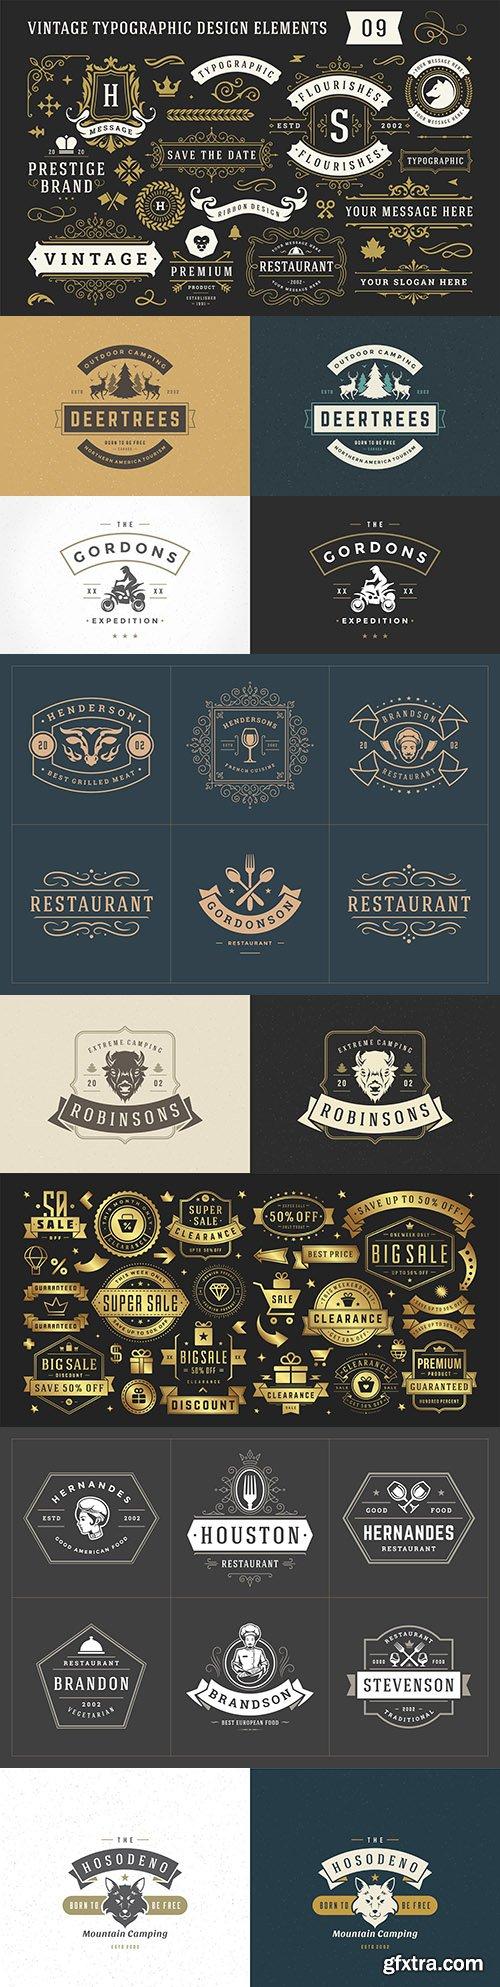 Ancient typographic decorative ornament set design elements